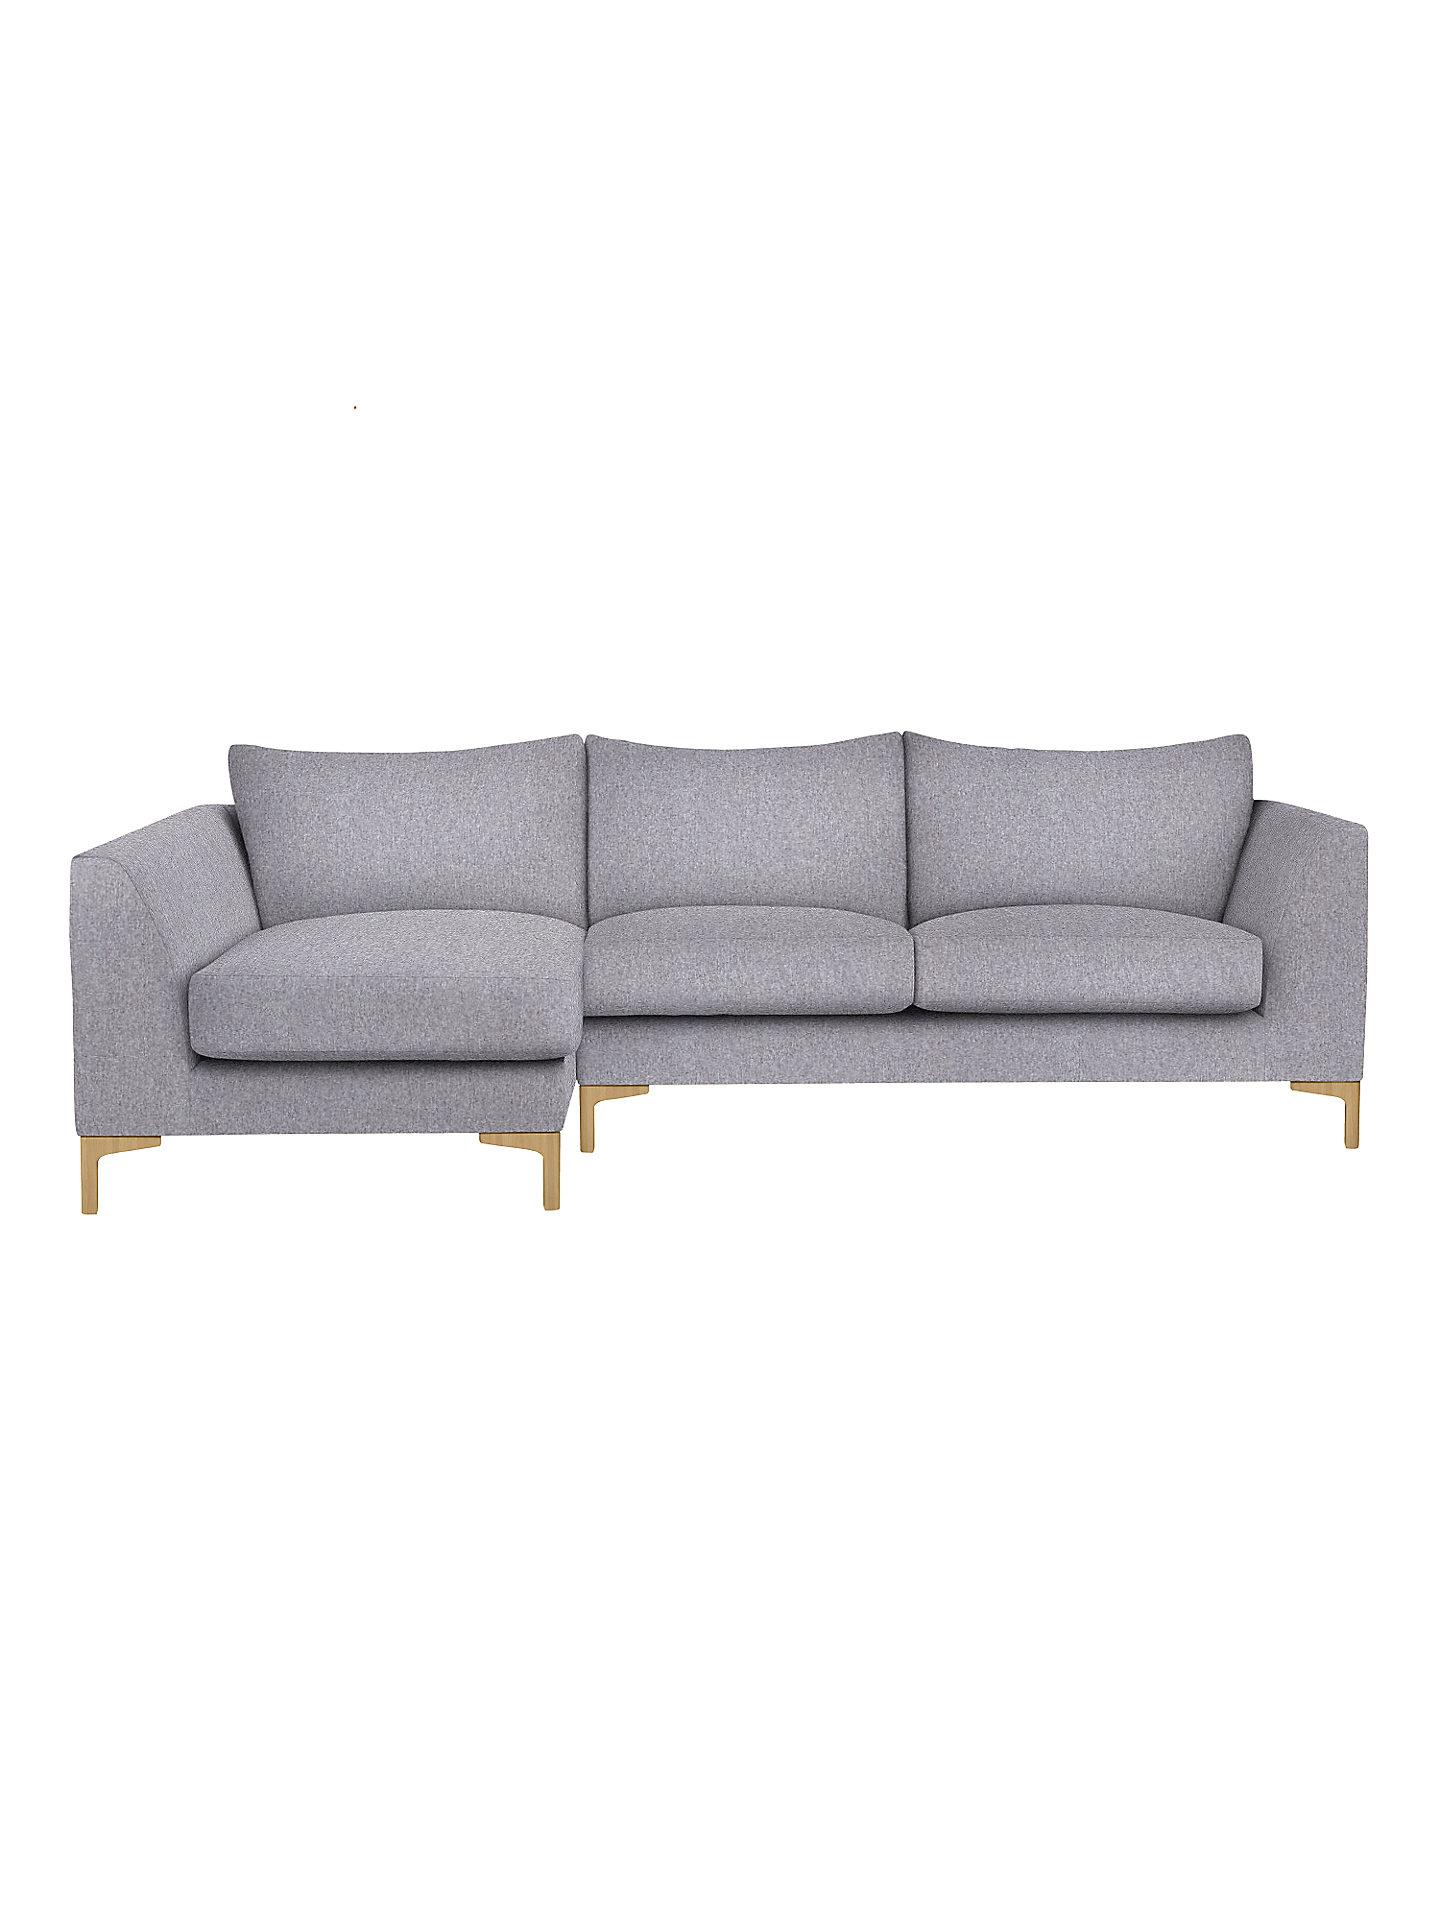 Buy John Lewis & Partners Belgrave LHF Chaise End Sofa Online at johnlewis.com